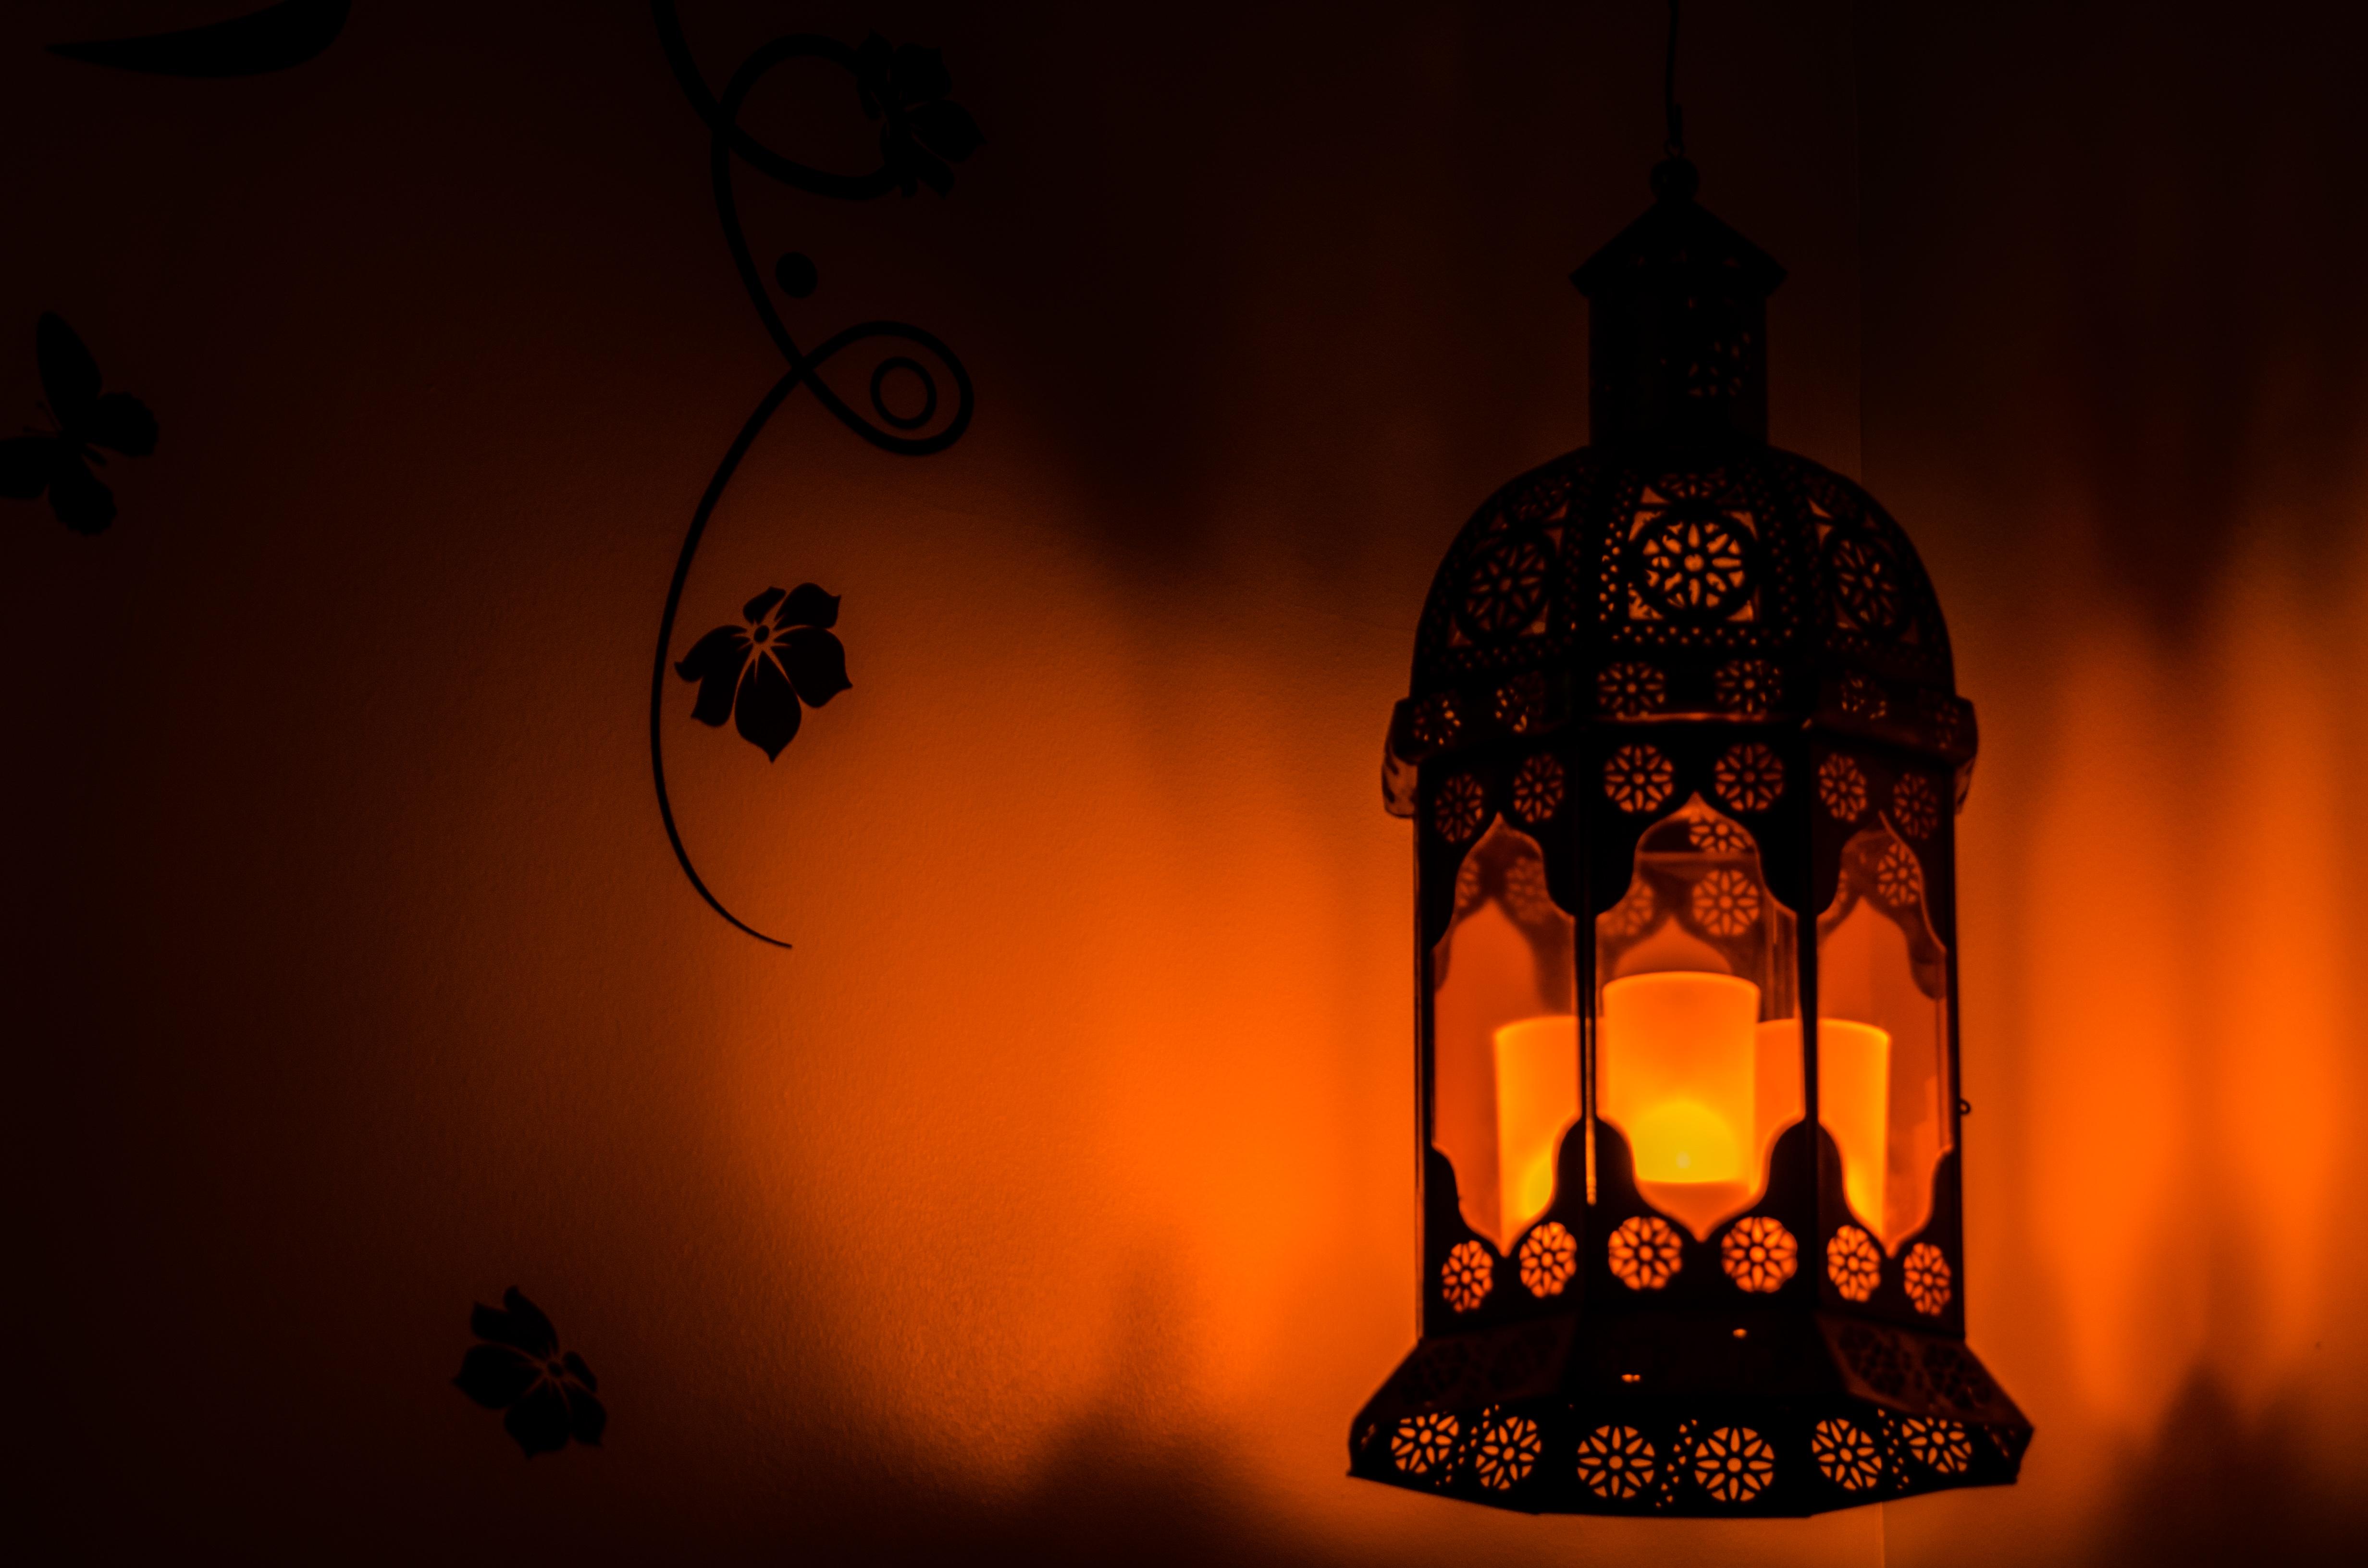 Sfondi lampada leggero oscurità halloween lanterna